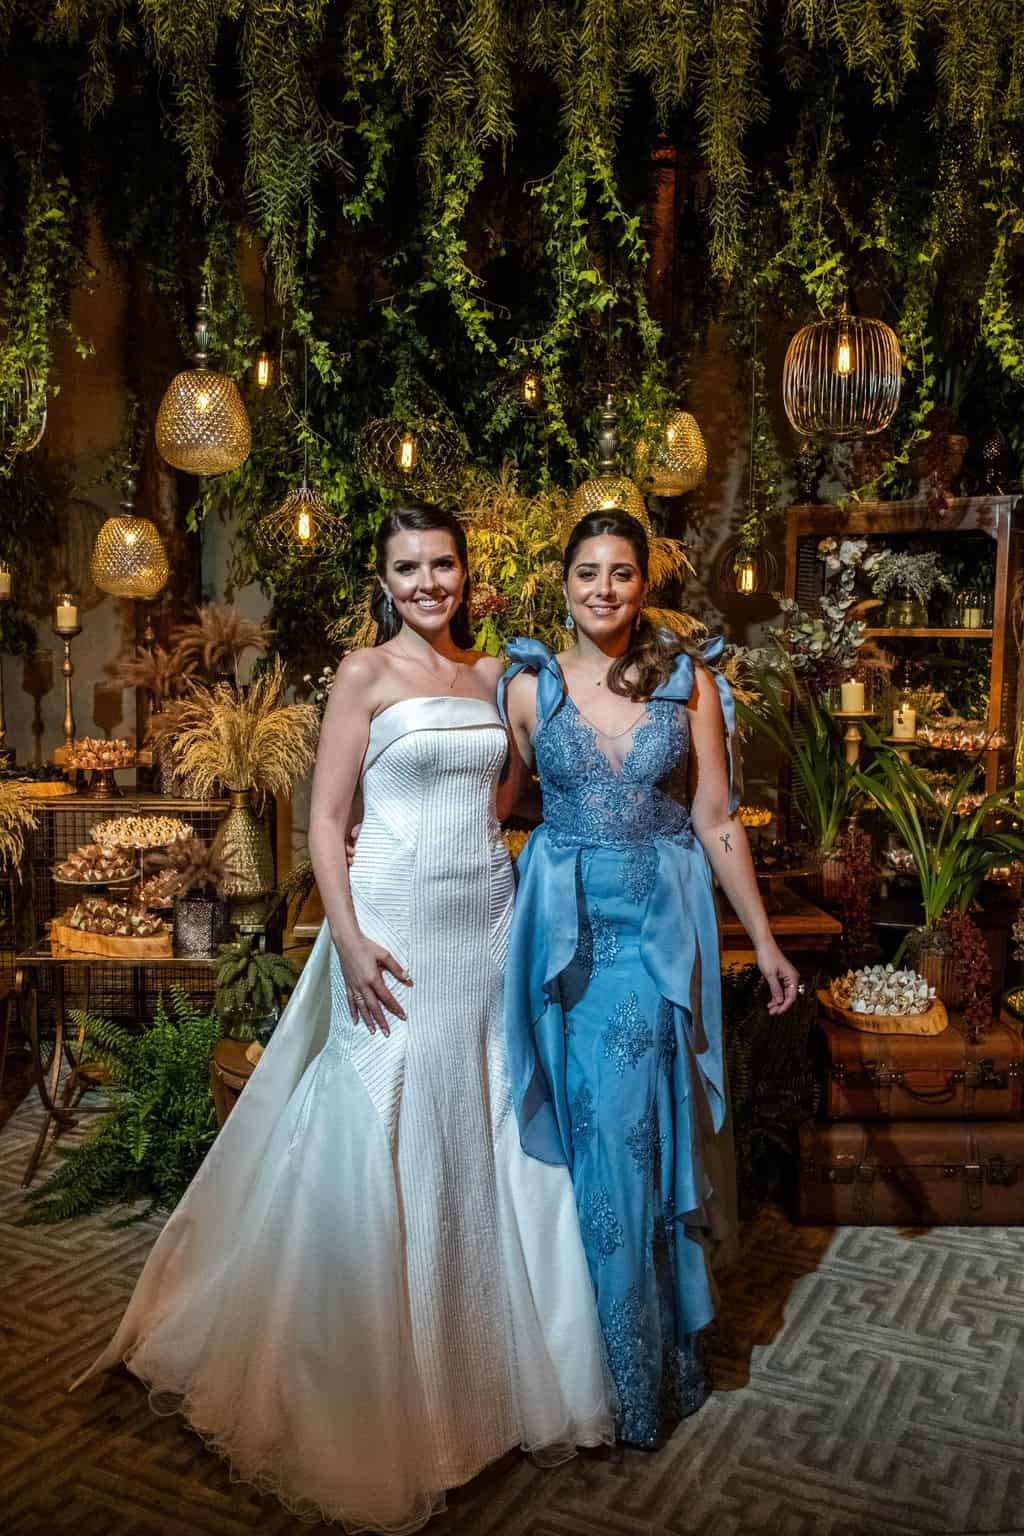 Bel-Benkler-eventos-Casamento-Ariane-e-Matheus-cerimonia-decoracao-contemporanea-fotografia-Rafael-Bigarelli-noivos-na-pista-Spazio-Giardini-26